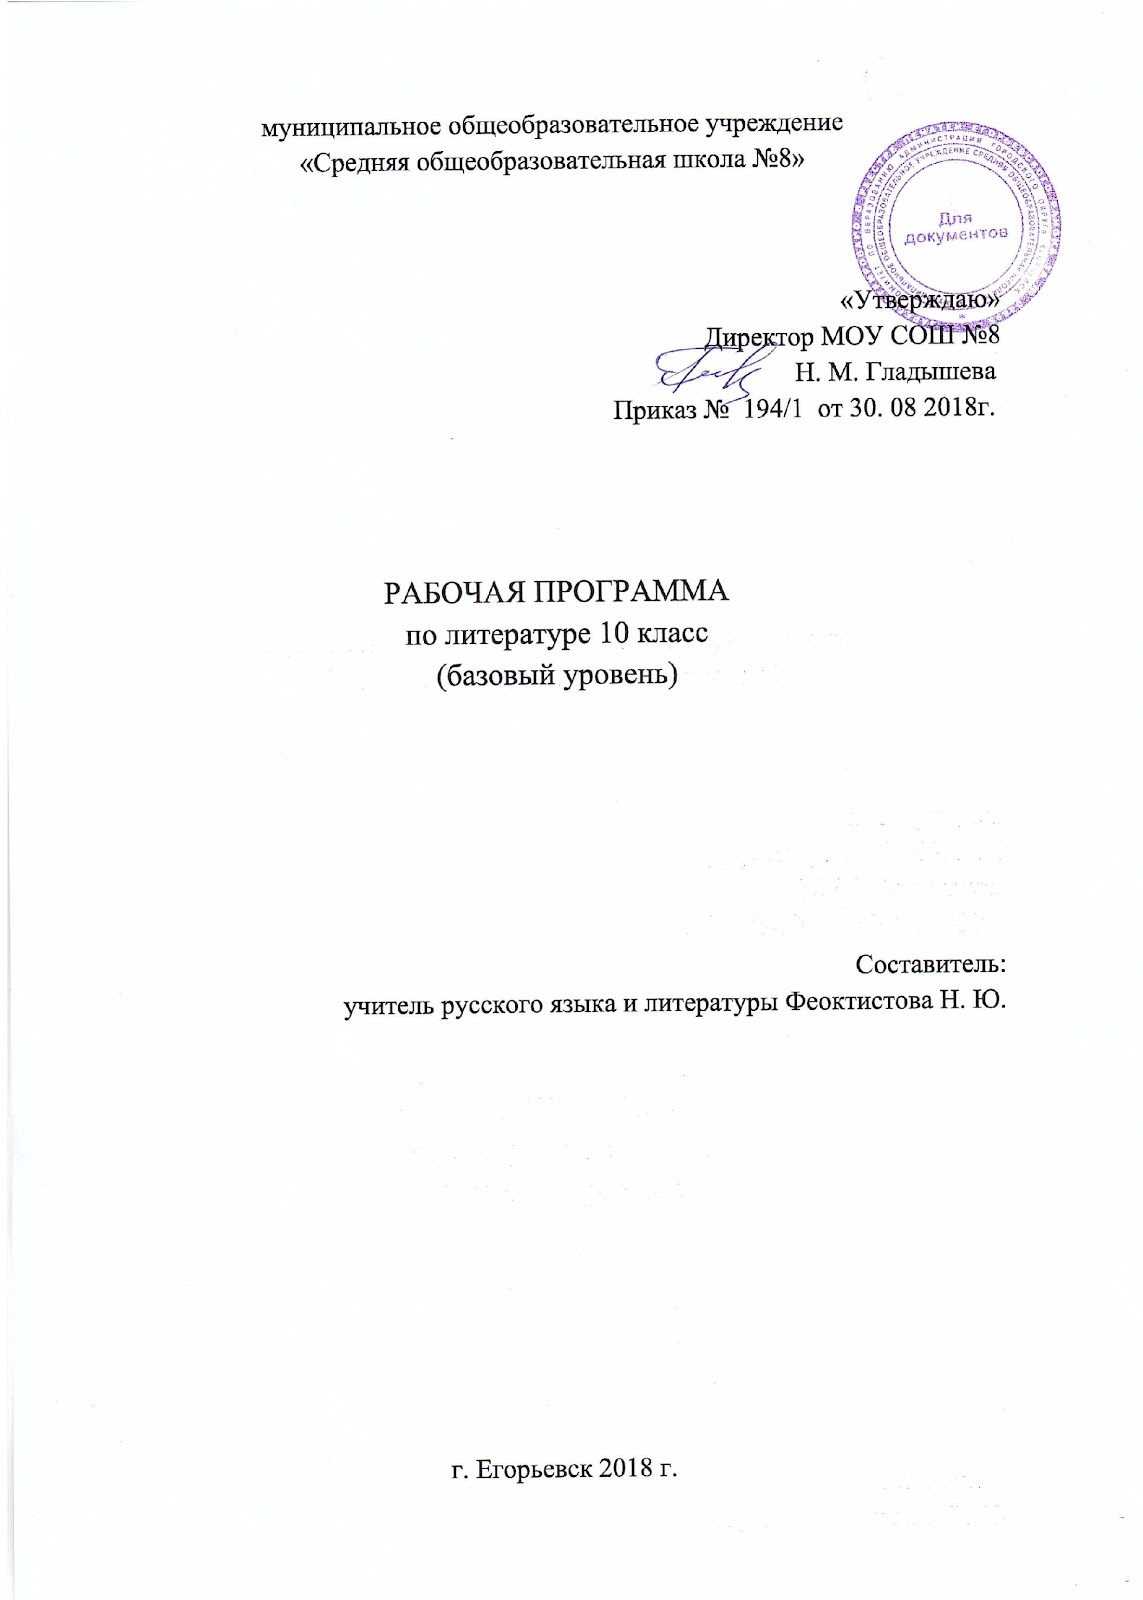 C:\Documents and Settings\Администратор\Рабочий стол\154455-4.jpg